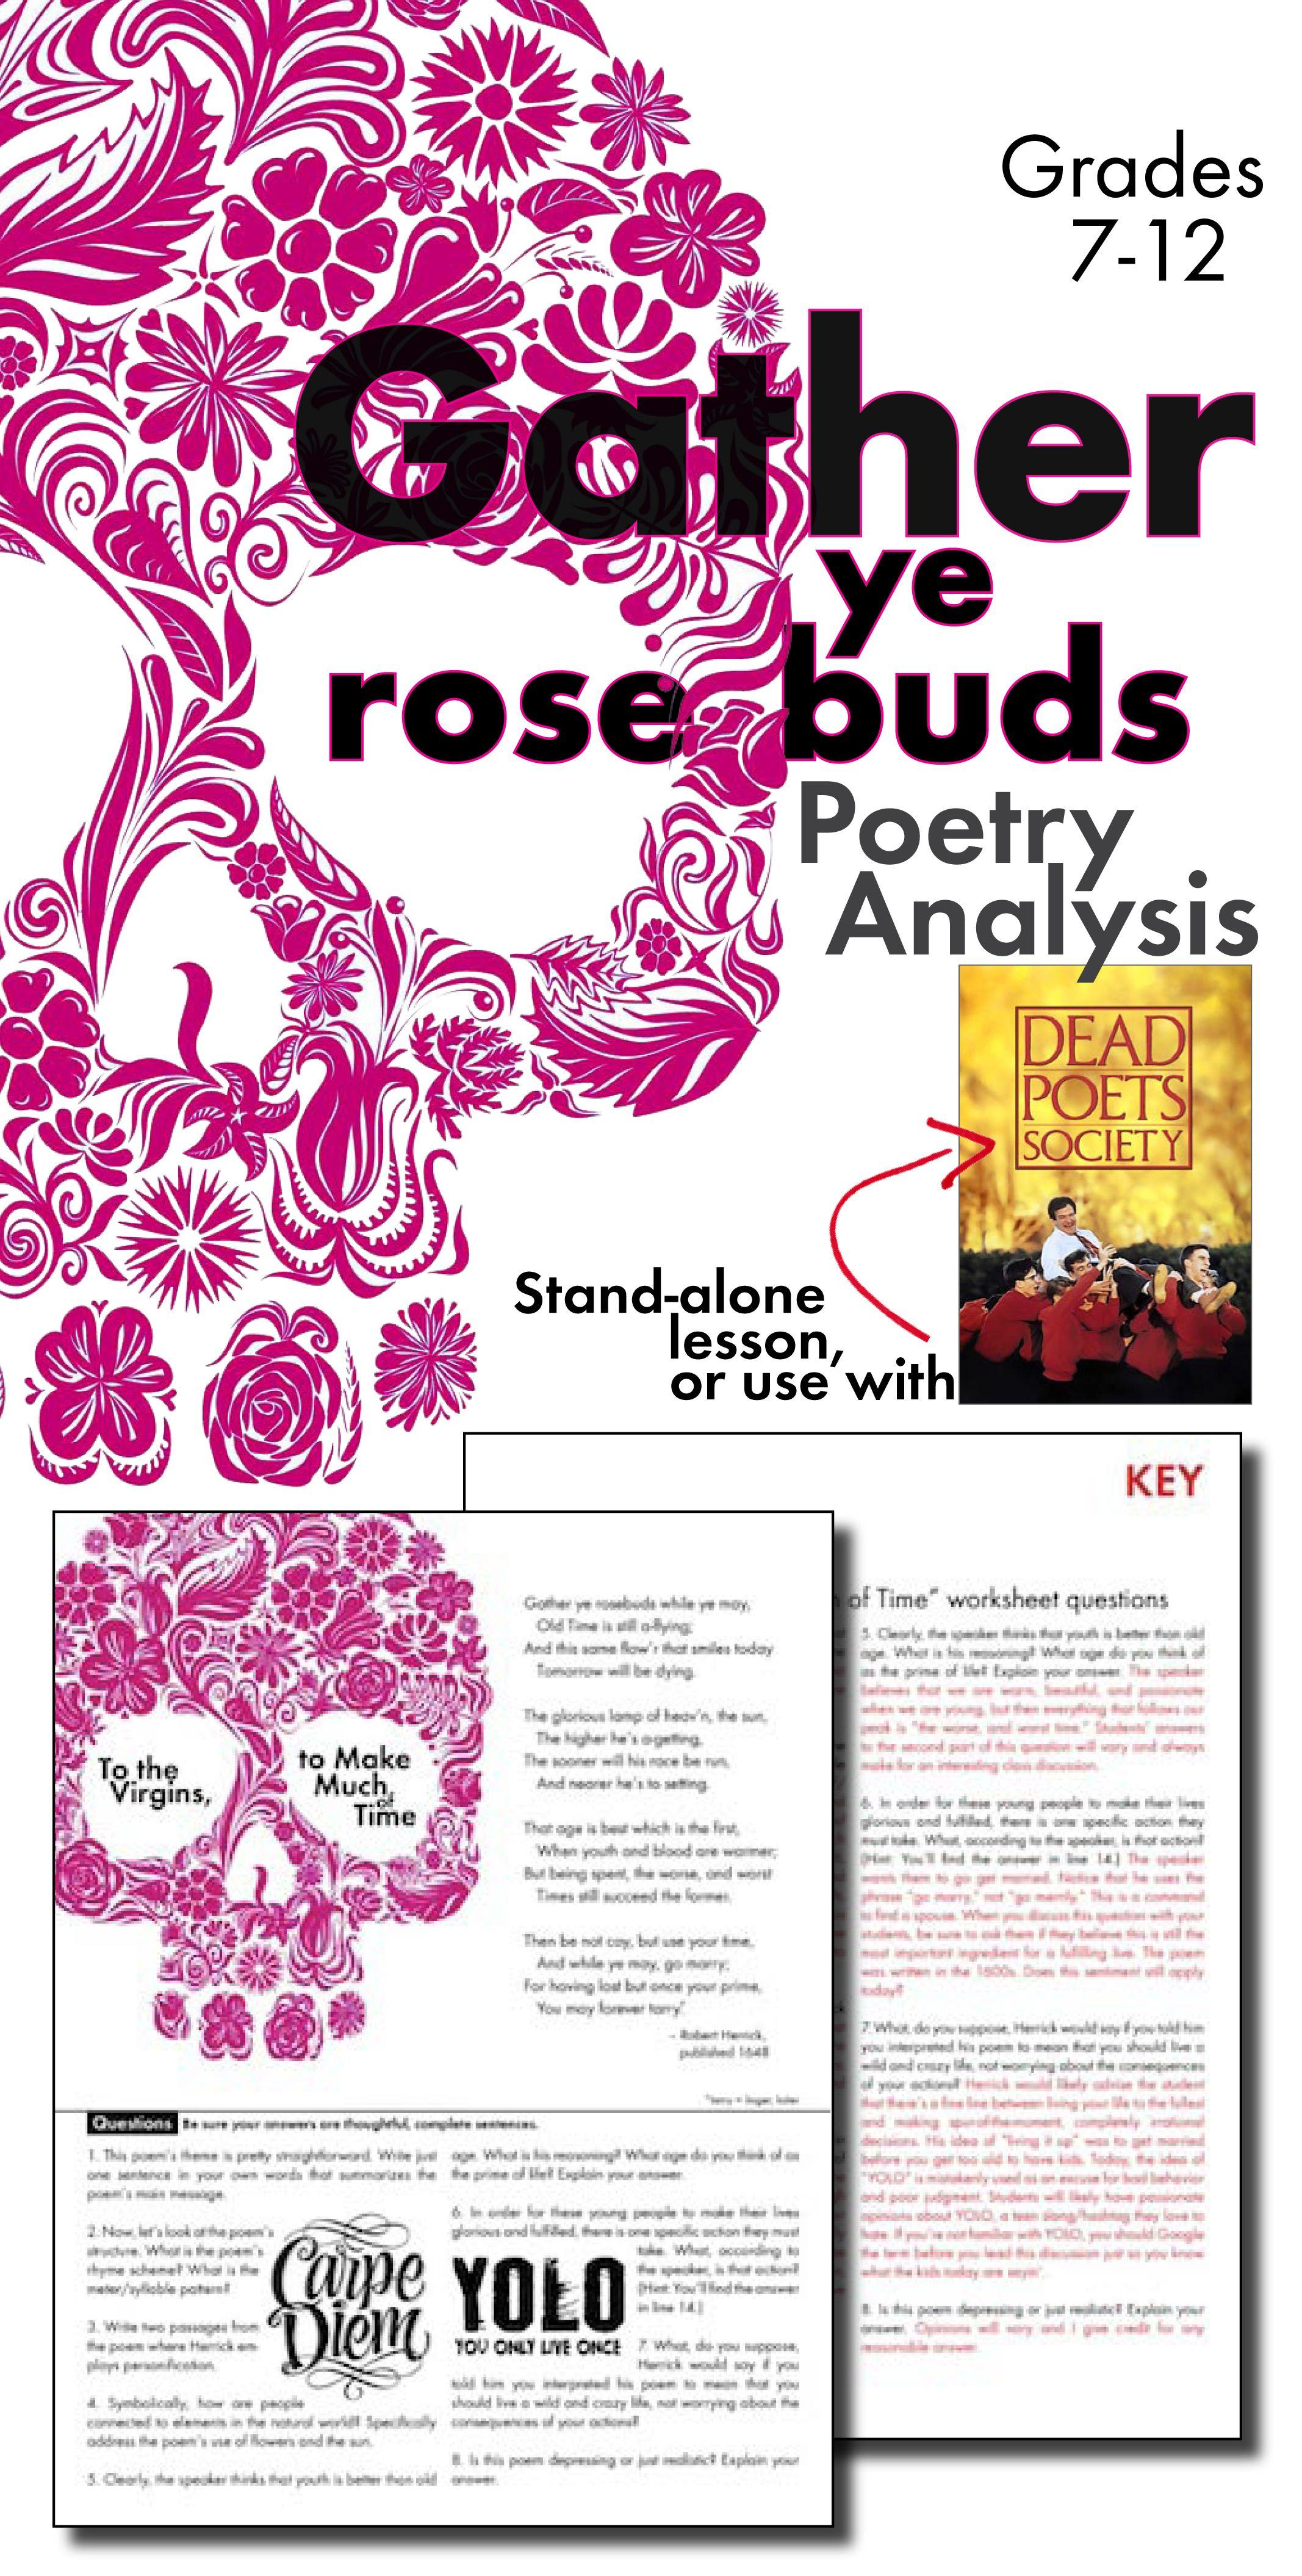 Gather Ye Rosebuds Poetryysis Worksheet For Robert